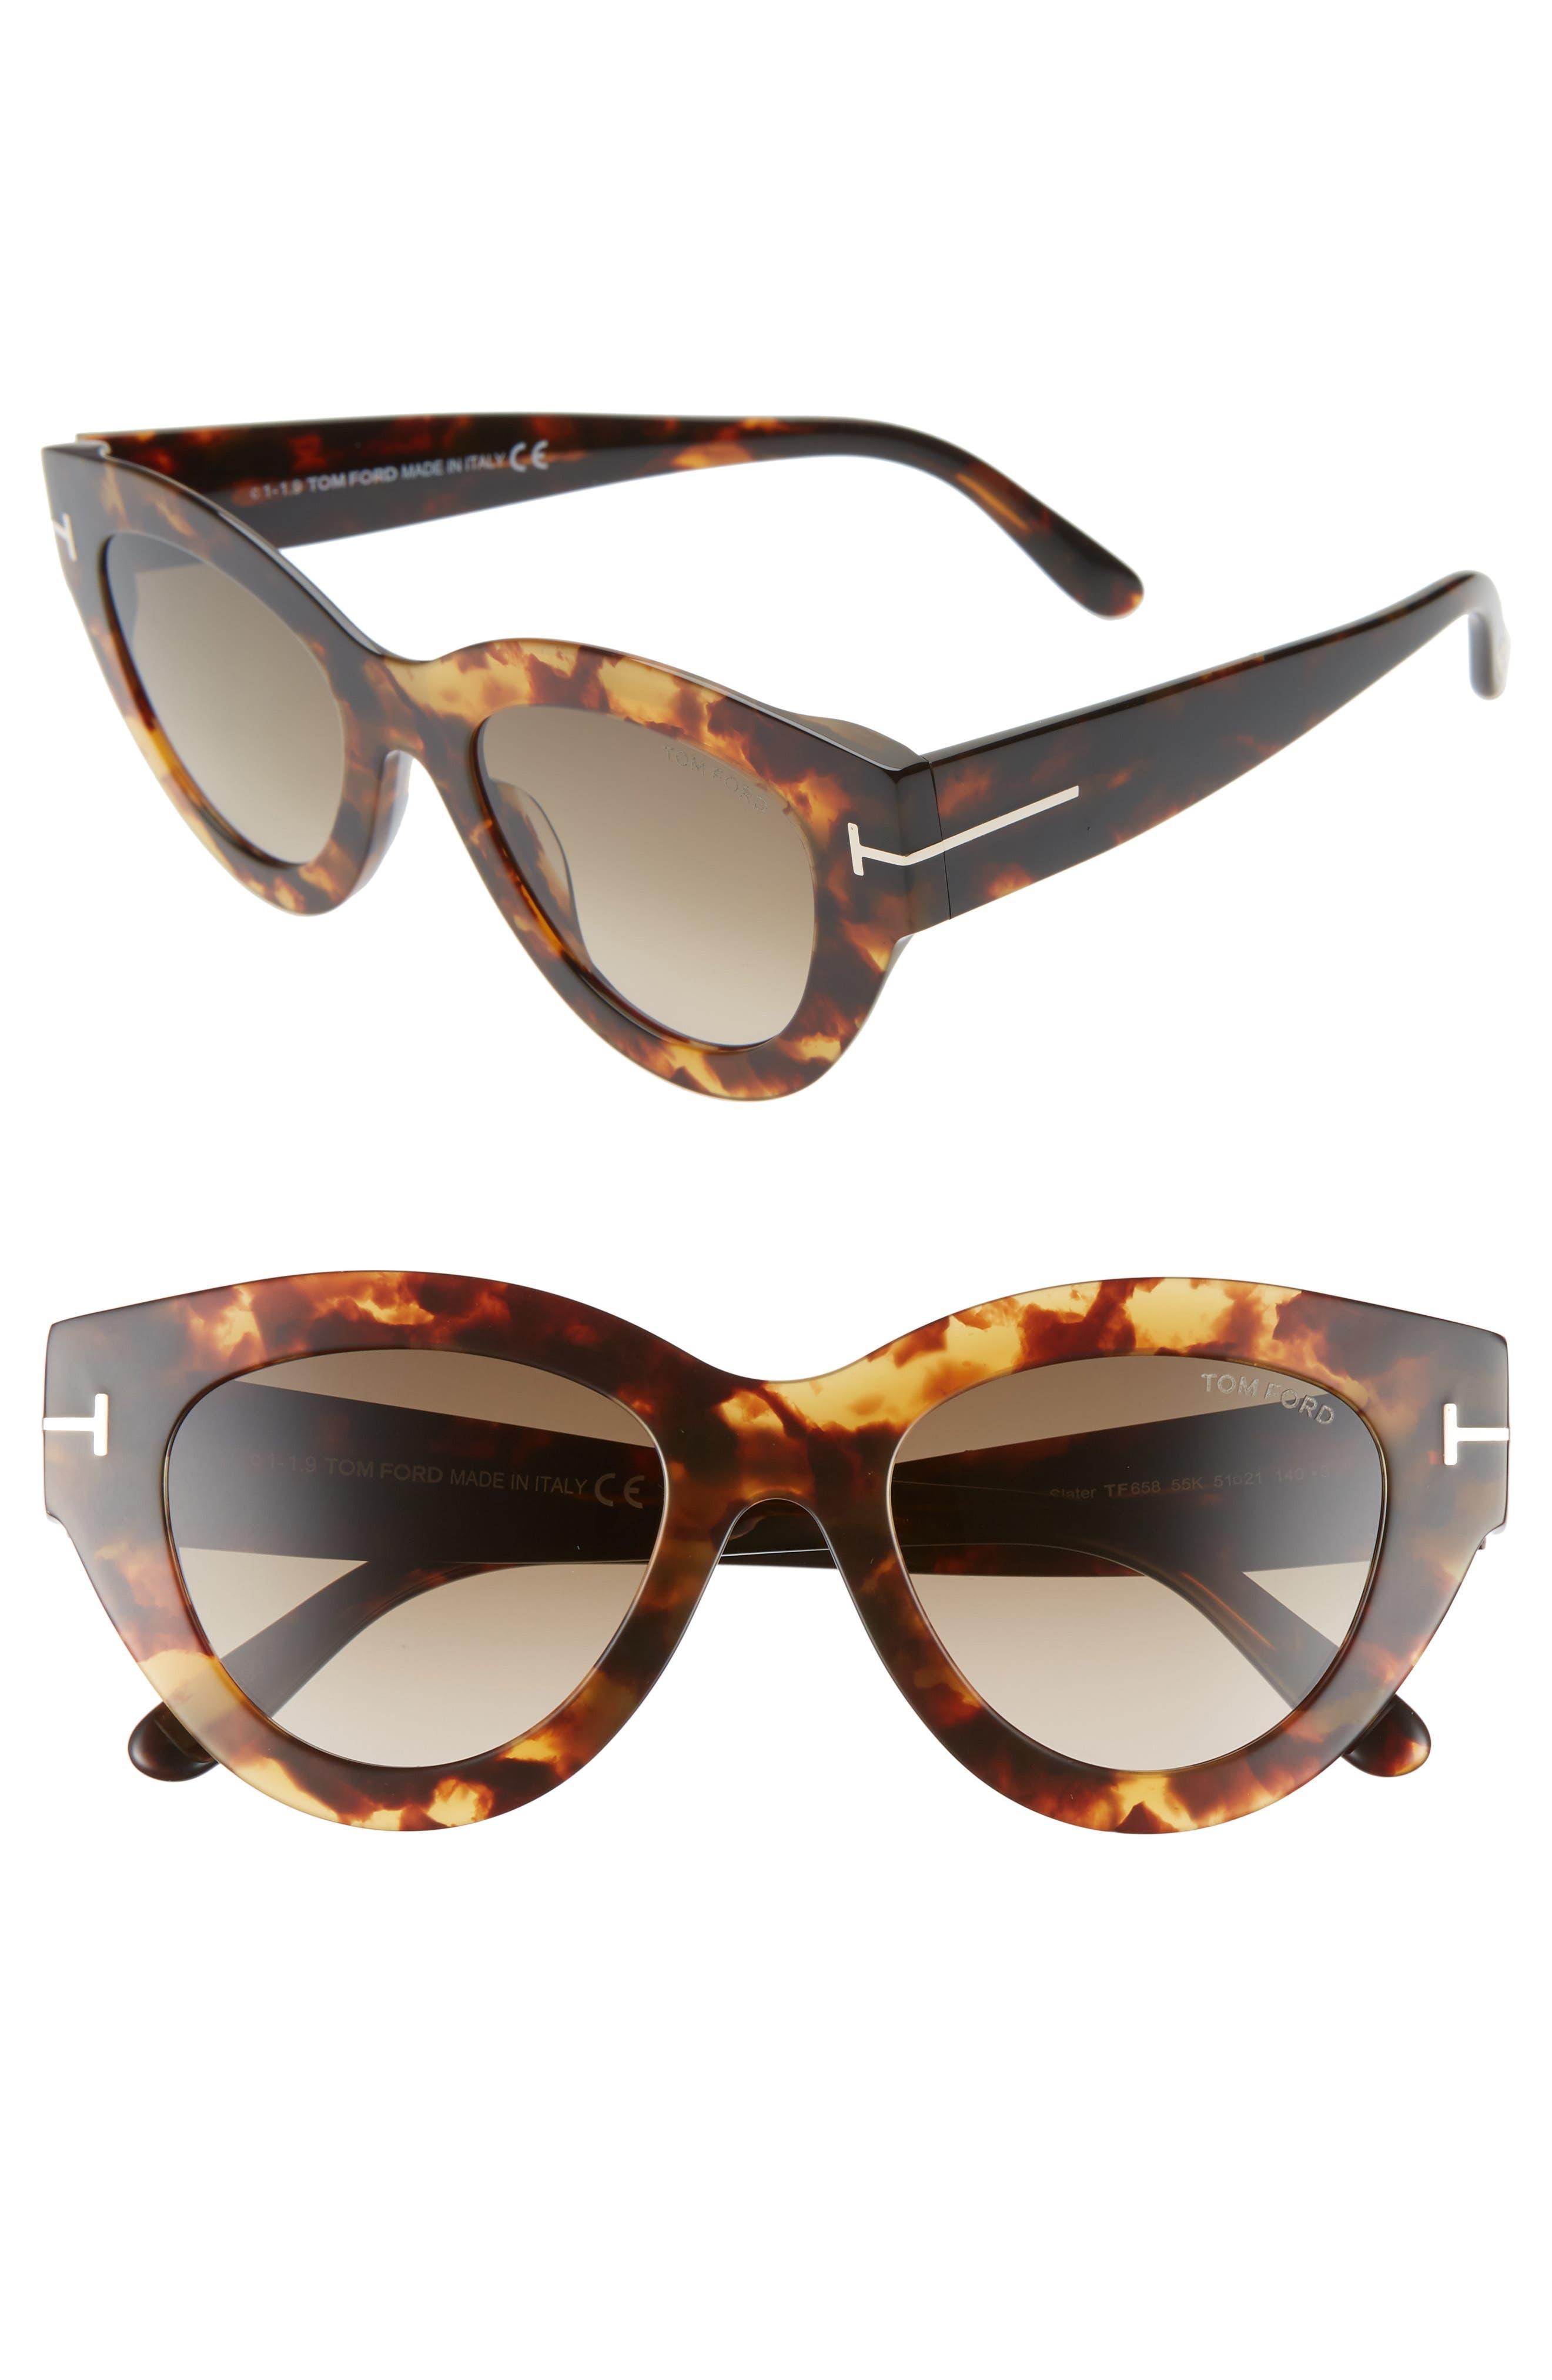 Tom Ford Slater 51Mm Cat Eye Sunglasses - Havana/ Gradient Roviex